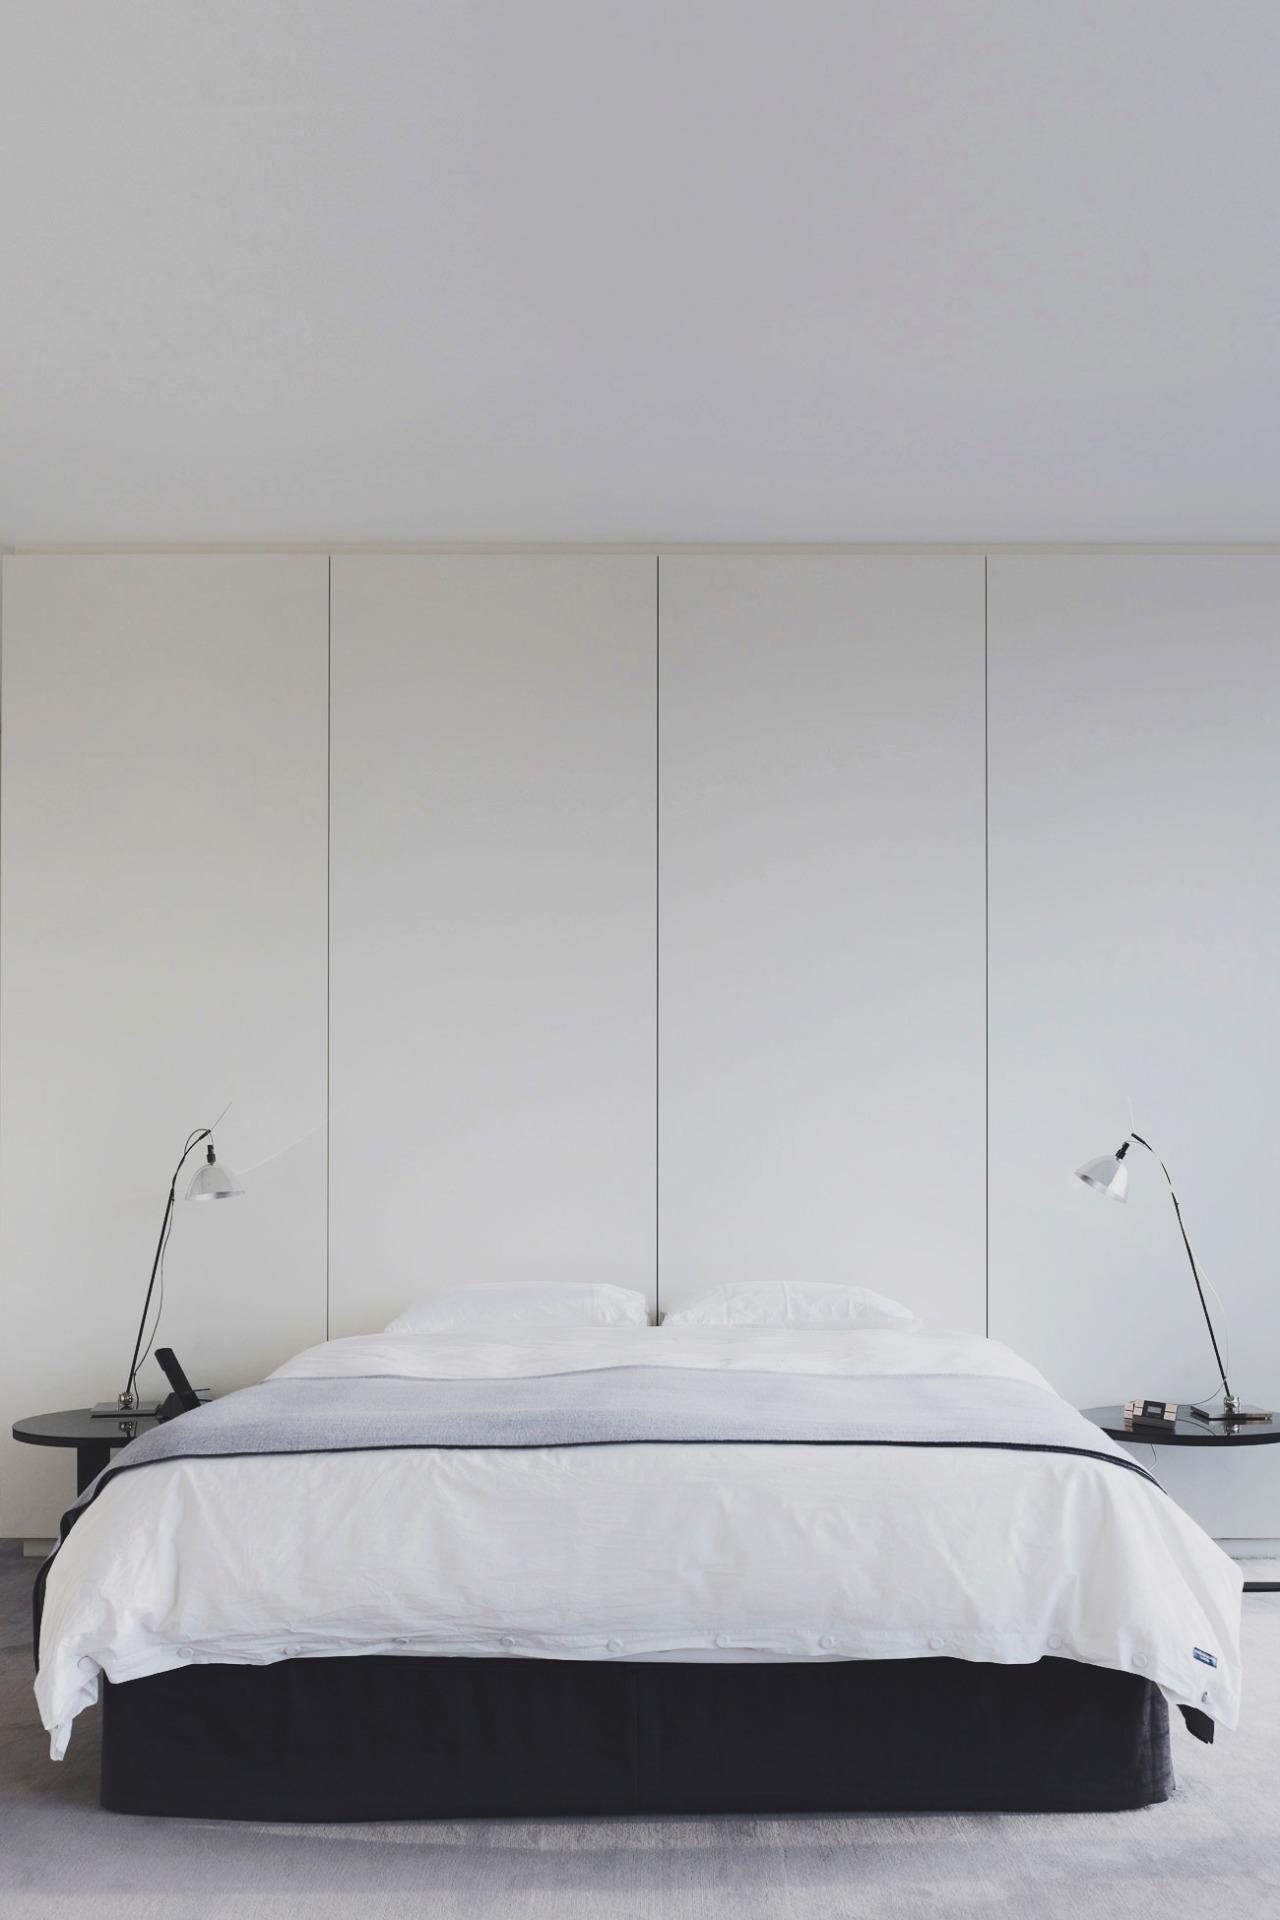 Bedroom ITCHBAN.com